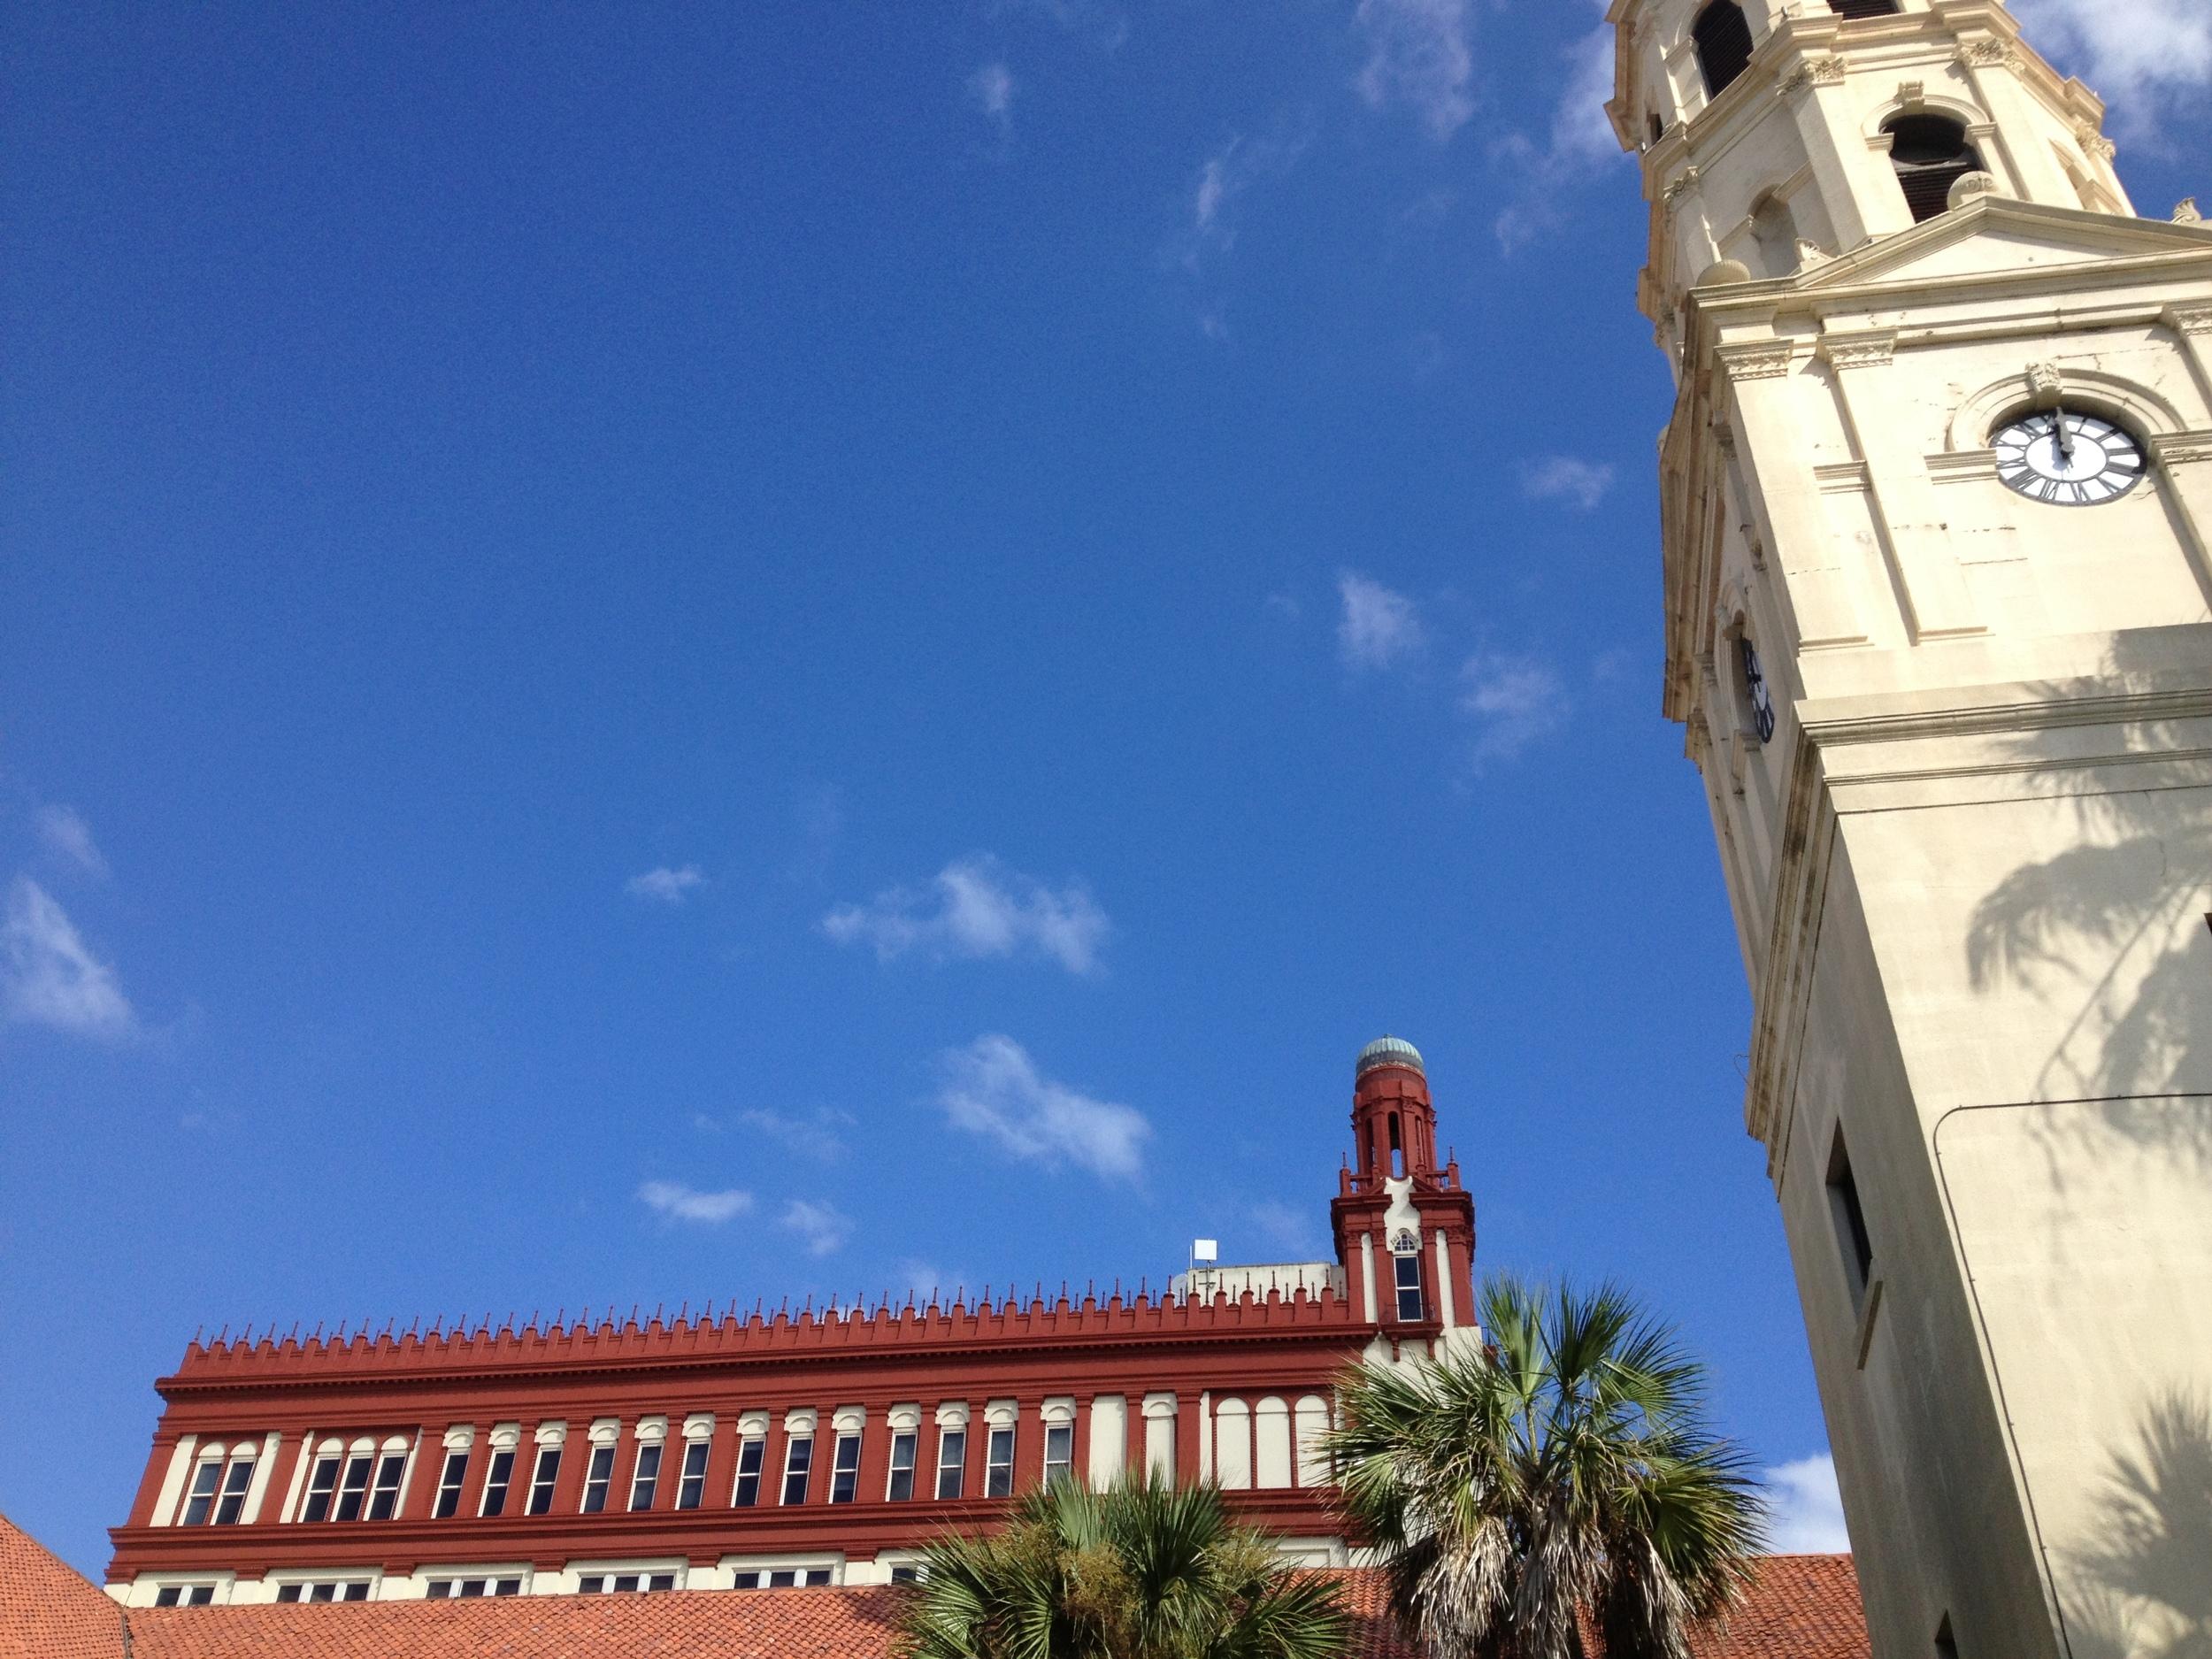 St. Augustine building-tops, October 11 2012